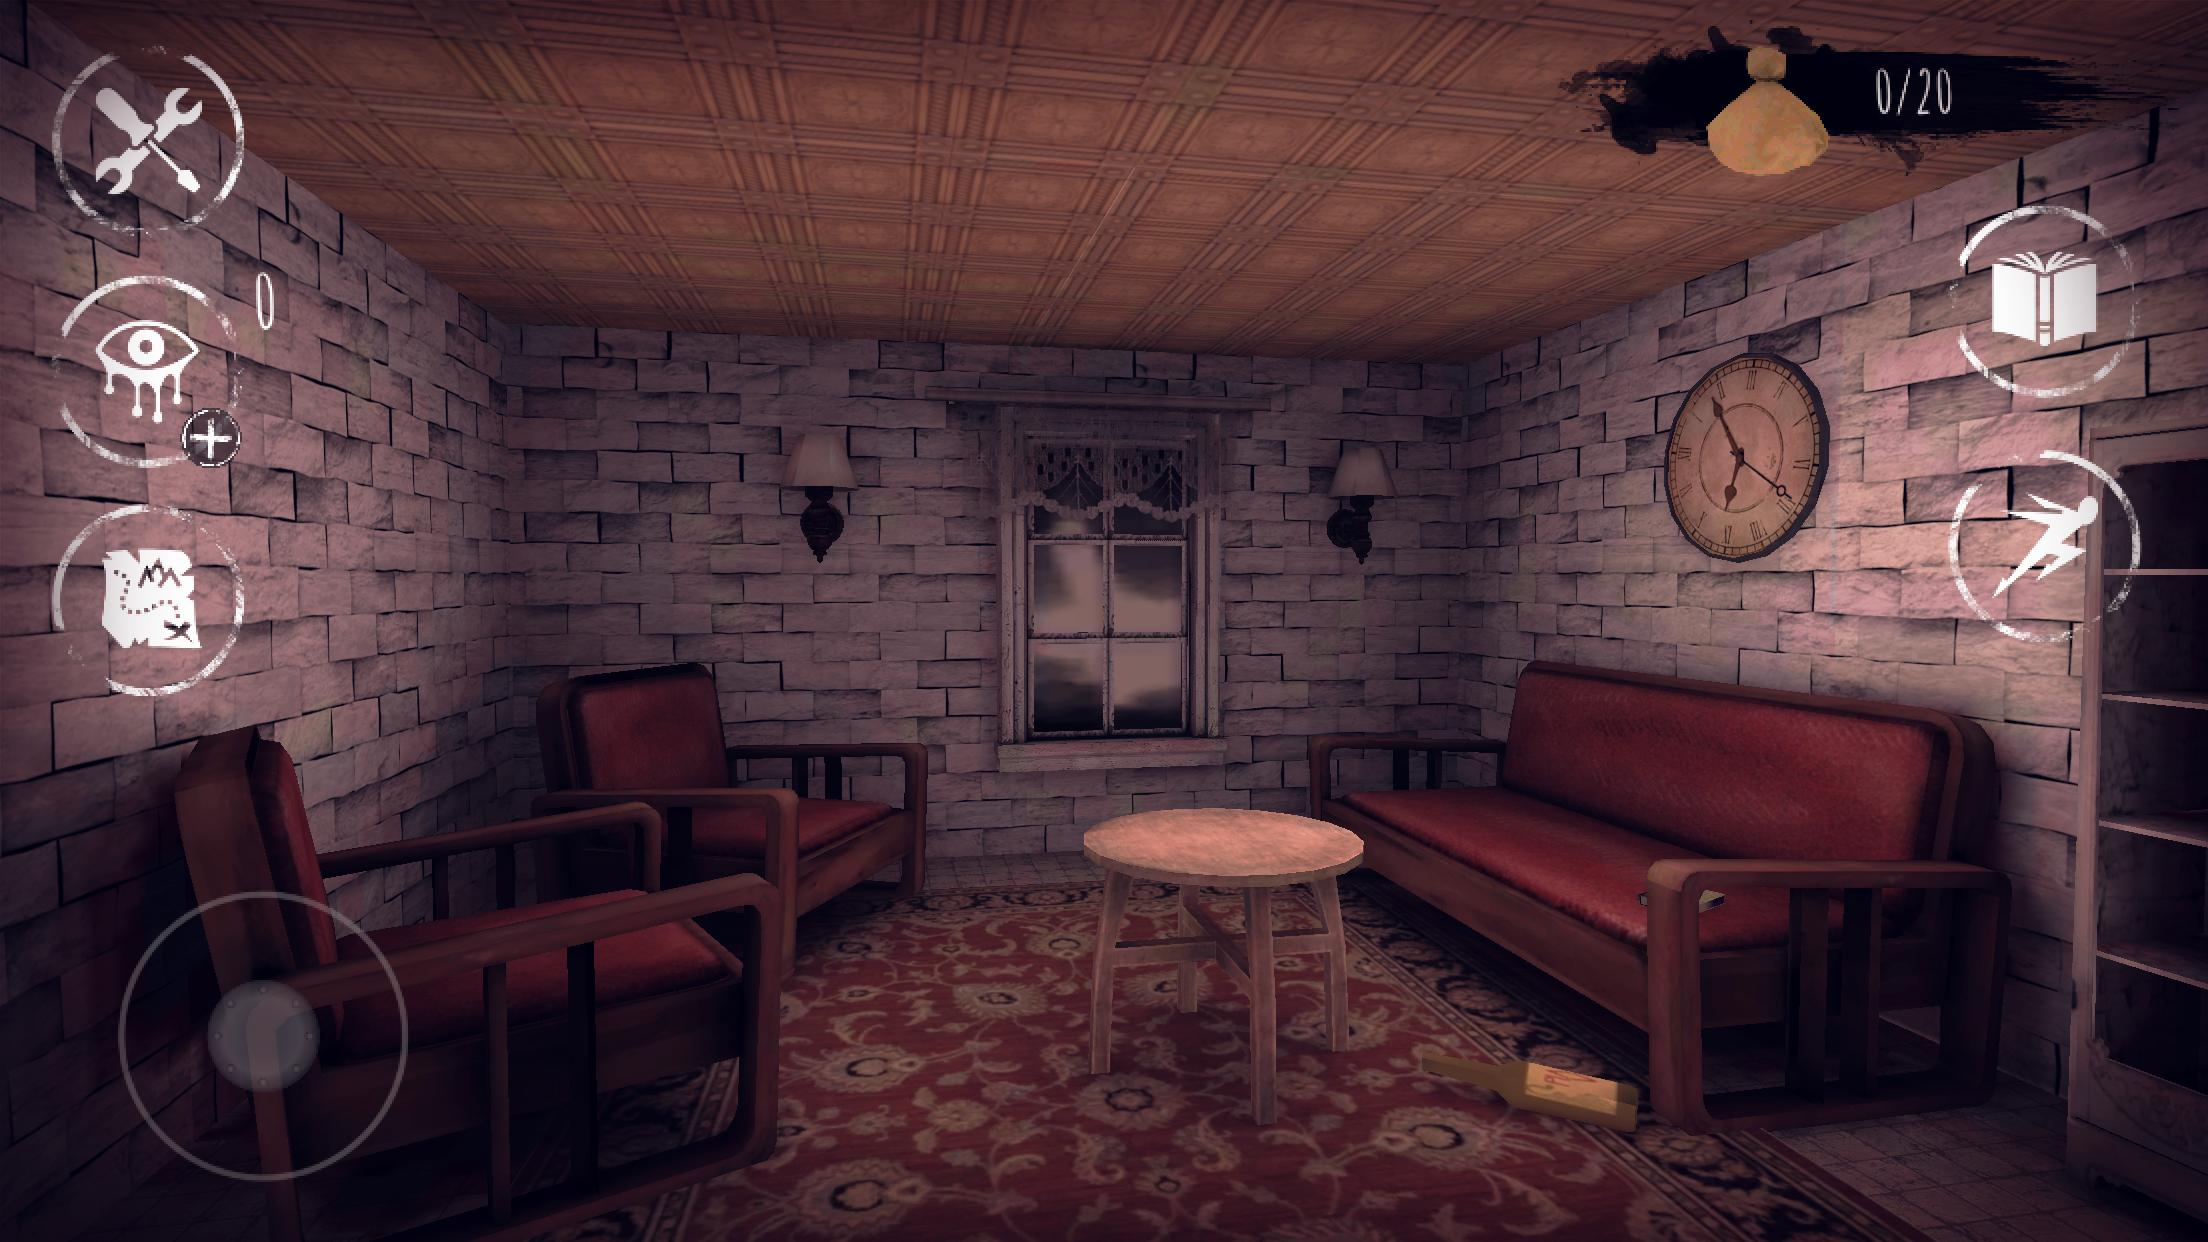 Eyes: Scary Thriller - Creepy Horror Game 6.1.1 Screenshot 12